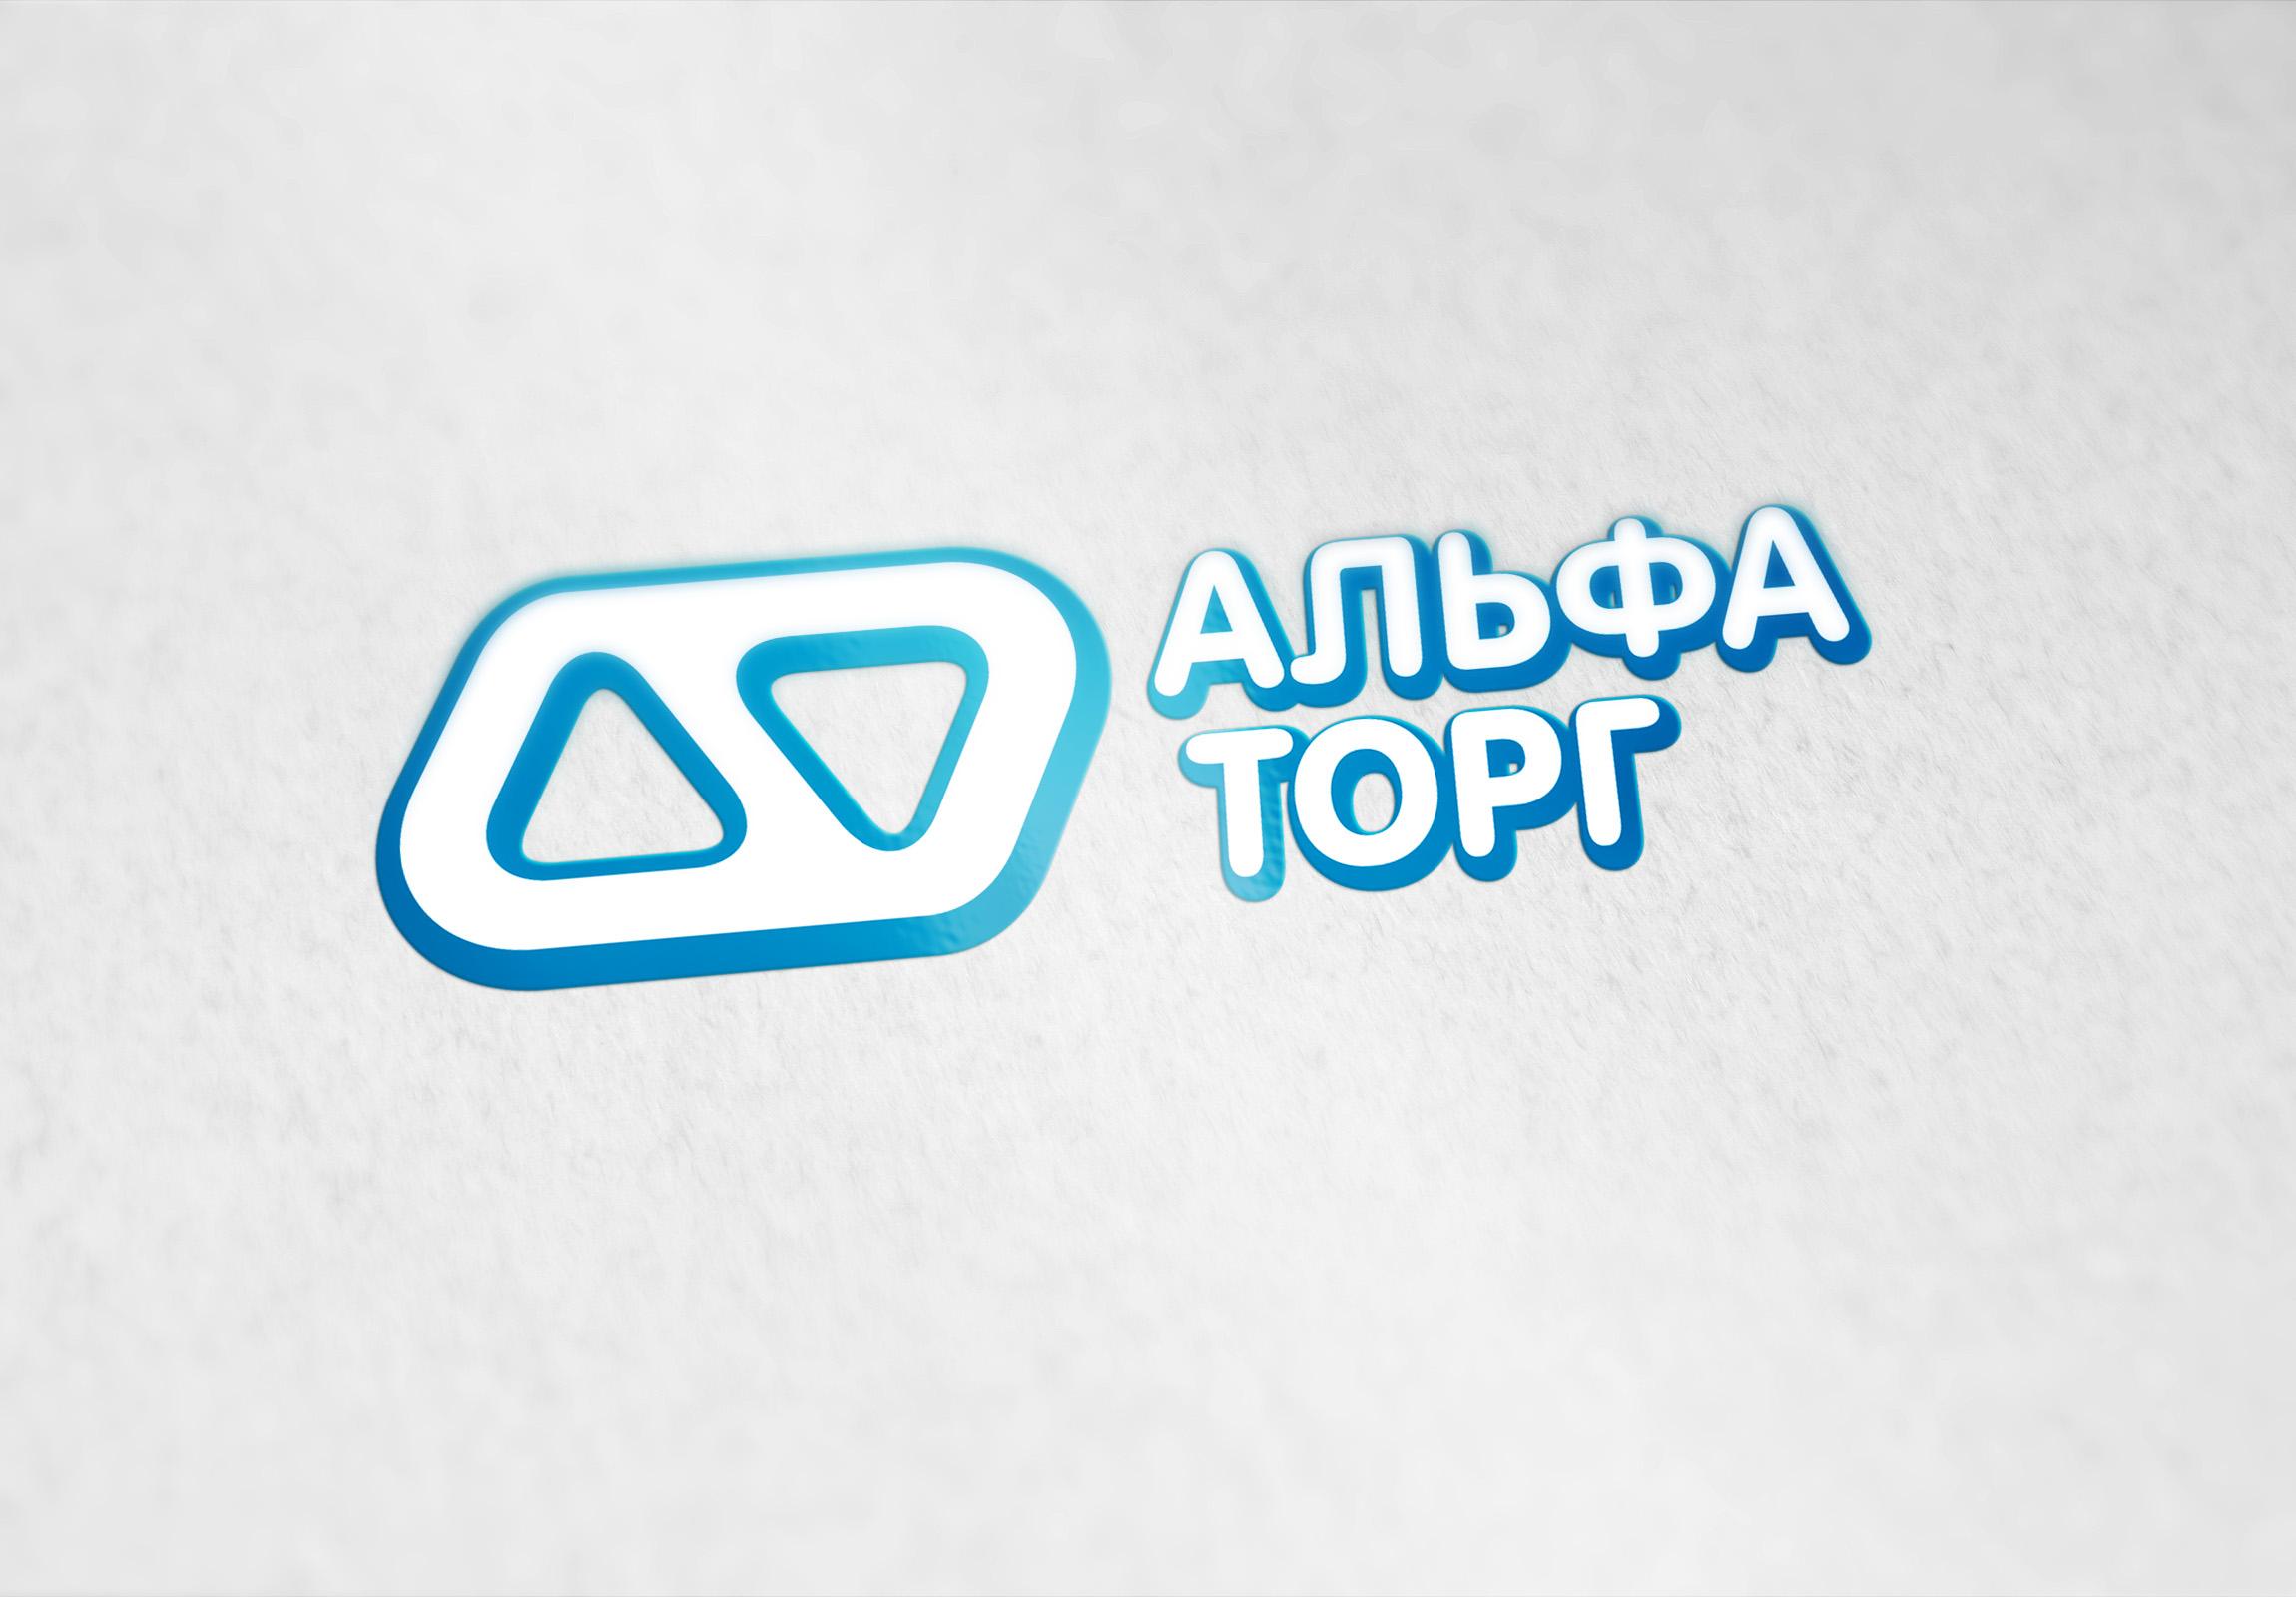 Логотип и фирменный стиль фото f_9025f044d677c437.jpg